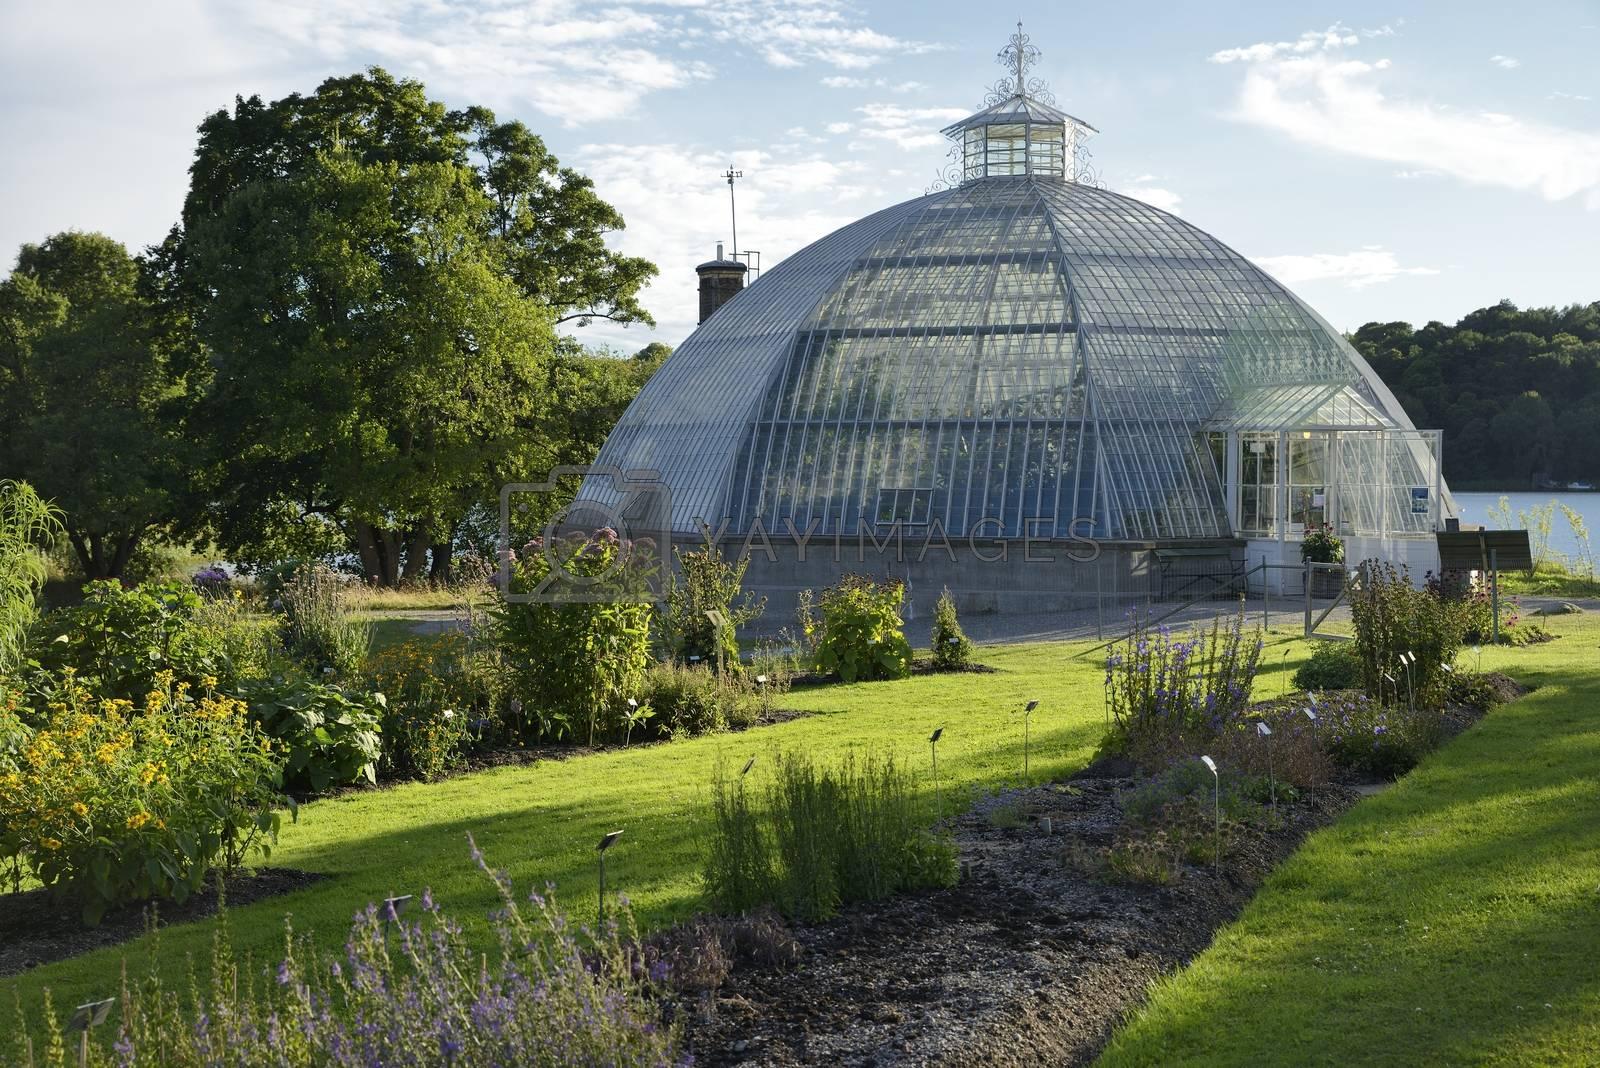 Old Greenhouse Dome in Bergiansk Botanical Garden. Is is a public botanical garden located in Frescati next to Brunnsviken, at Norra Djurgården in Stockholm -Sweden.